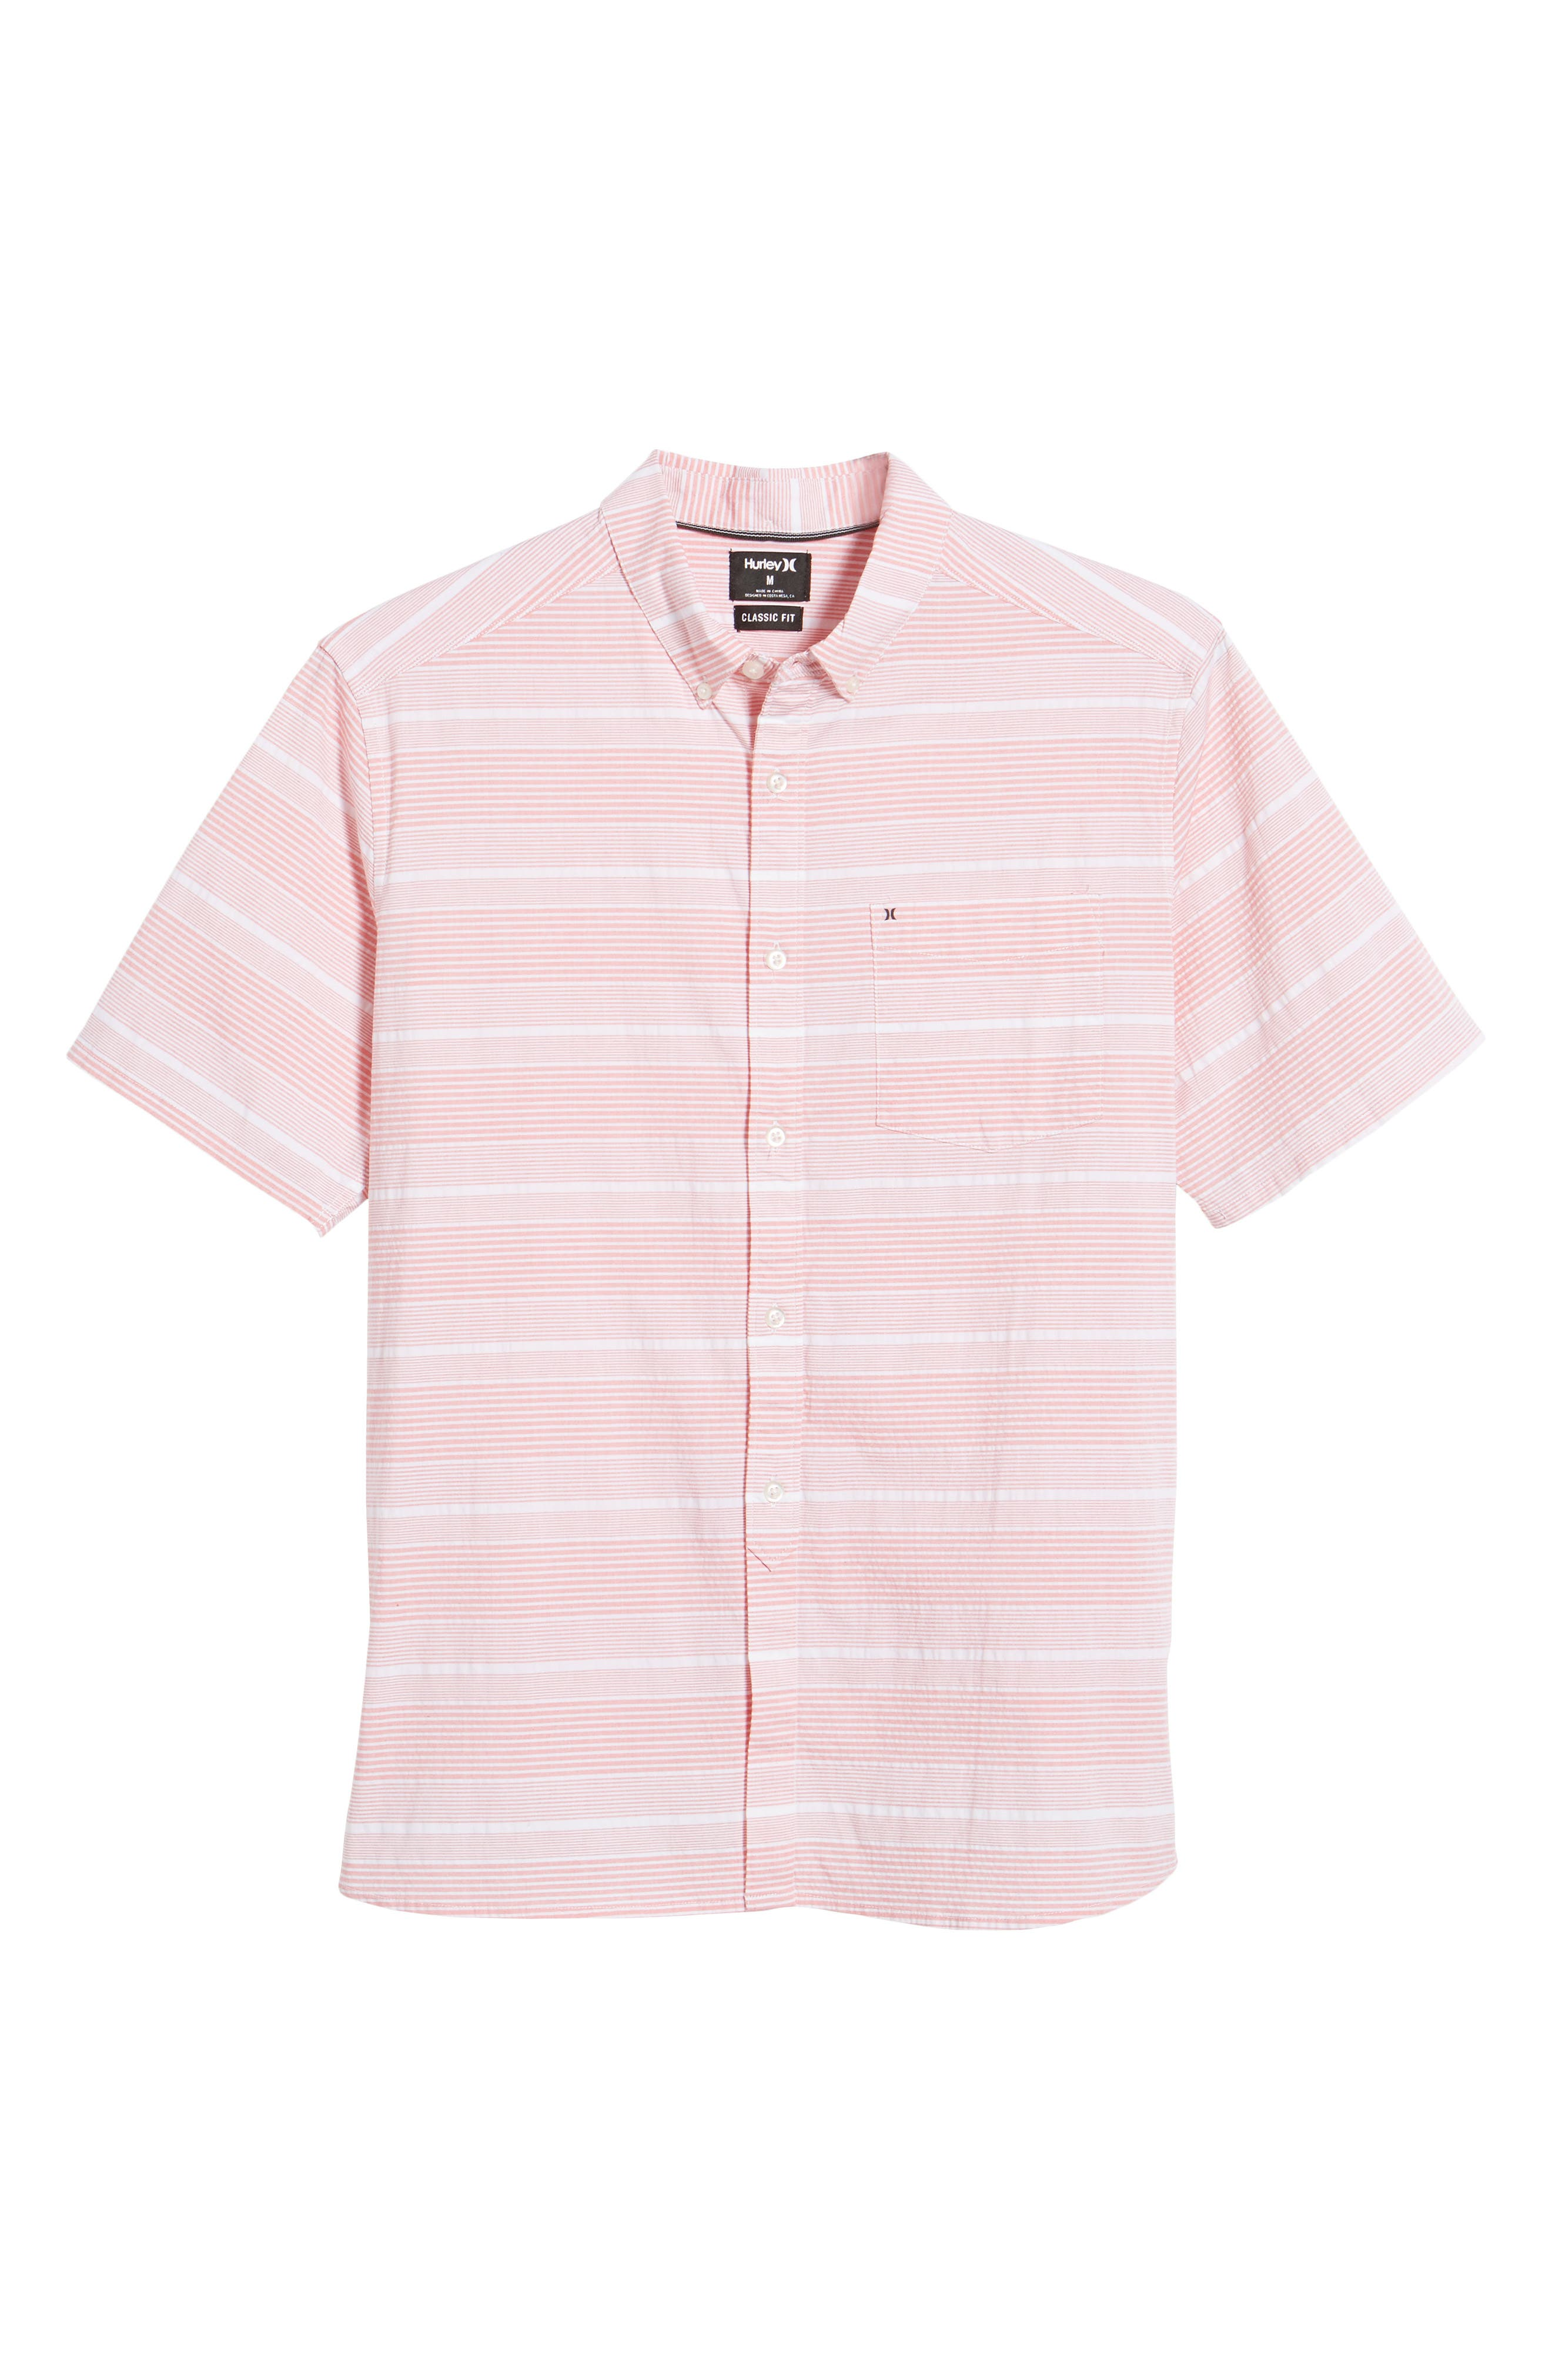 Surplus Short Sleeve Shirt,                             Alternate thumbnail 12, color,